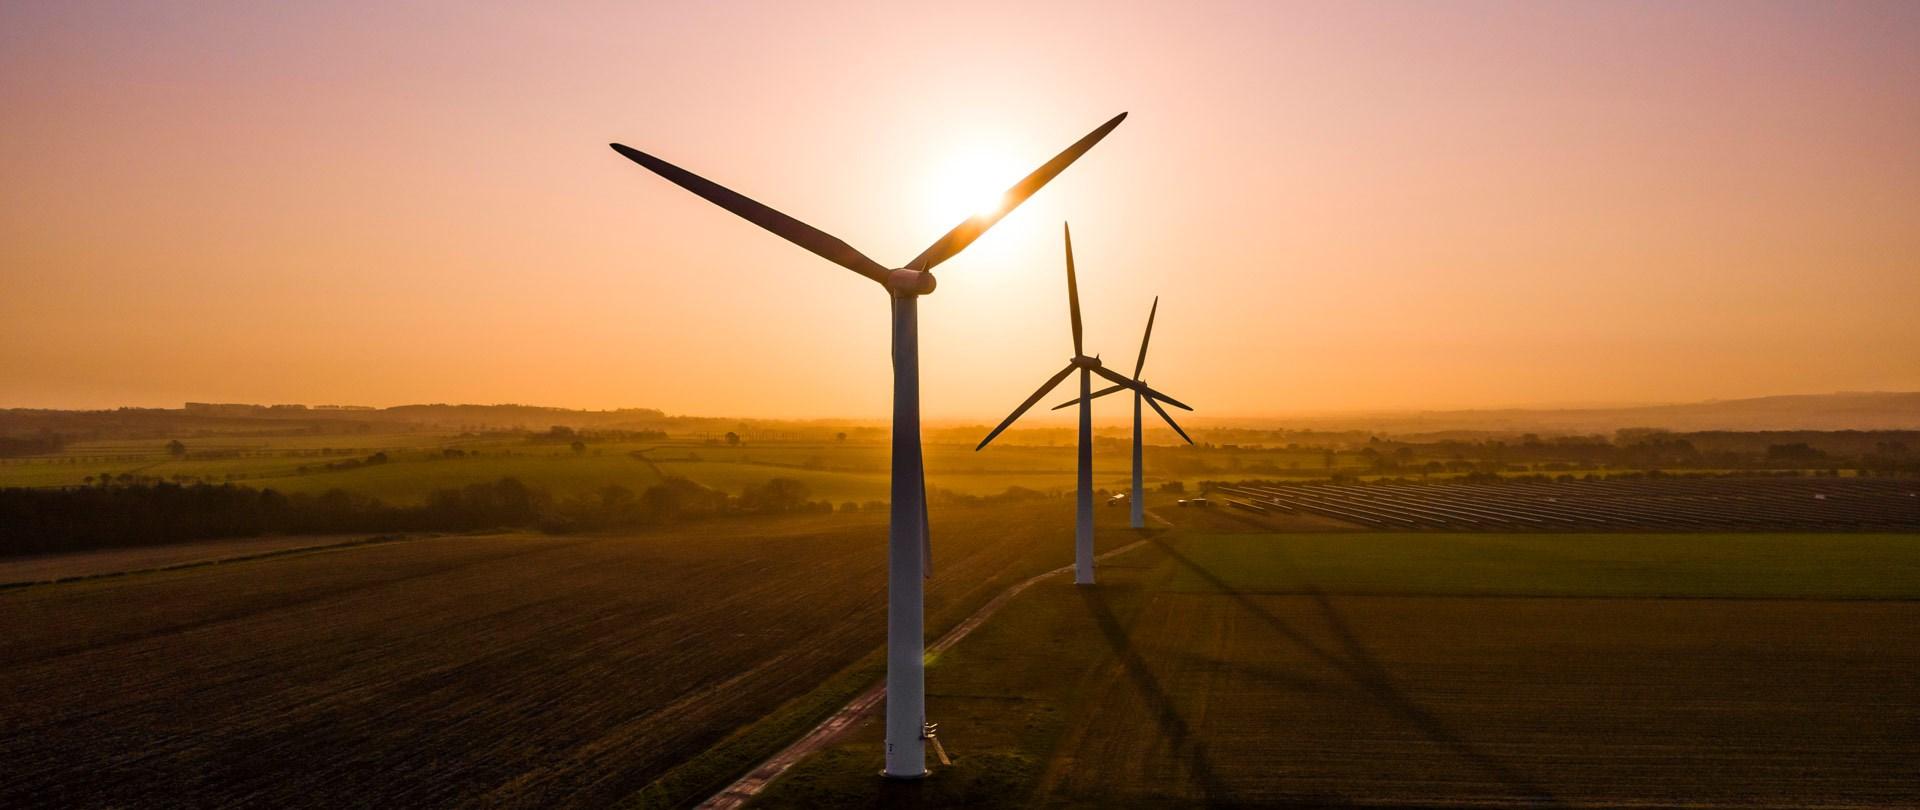 Sun Setting Over Wind Turbines In Field